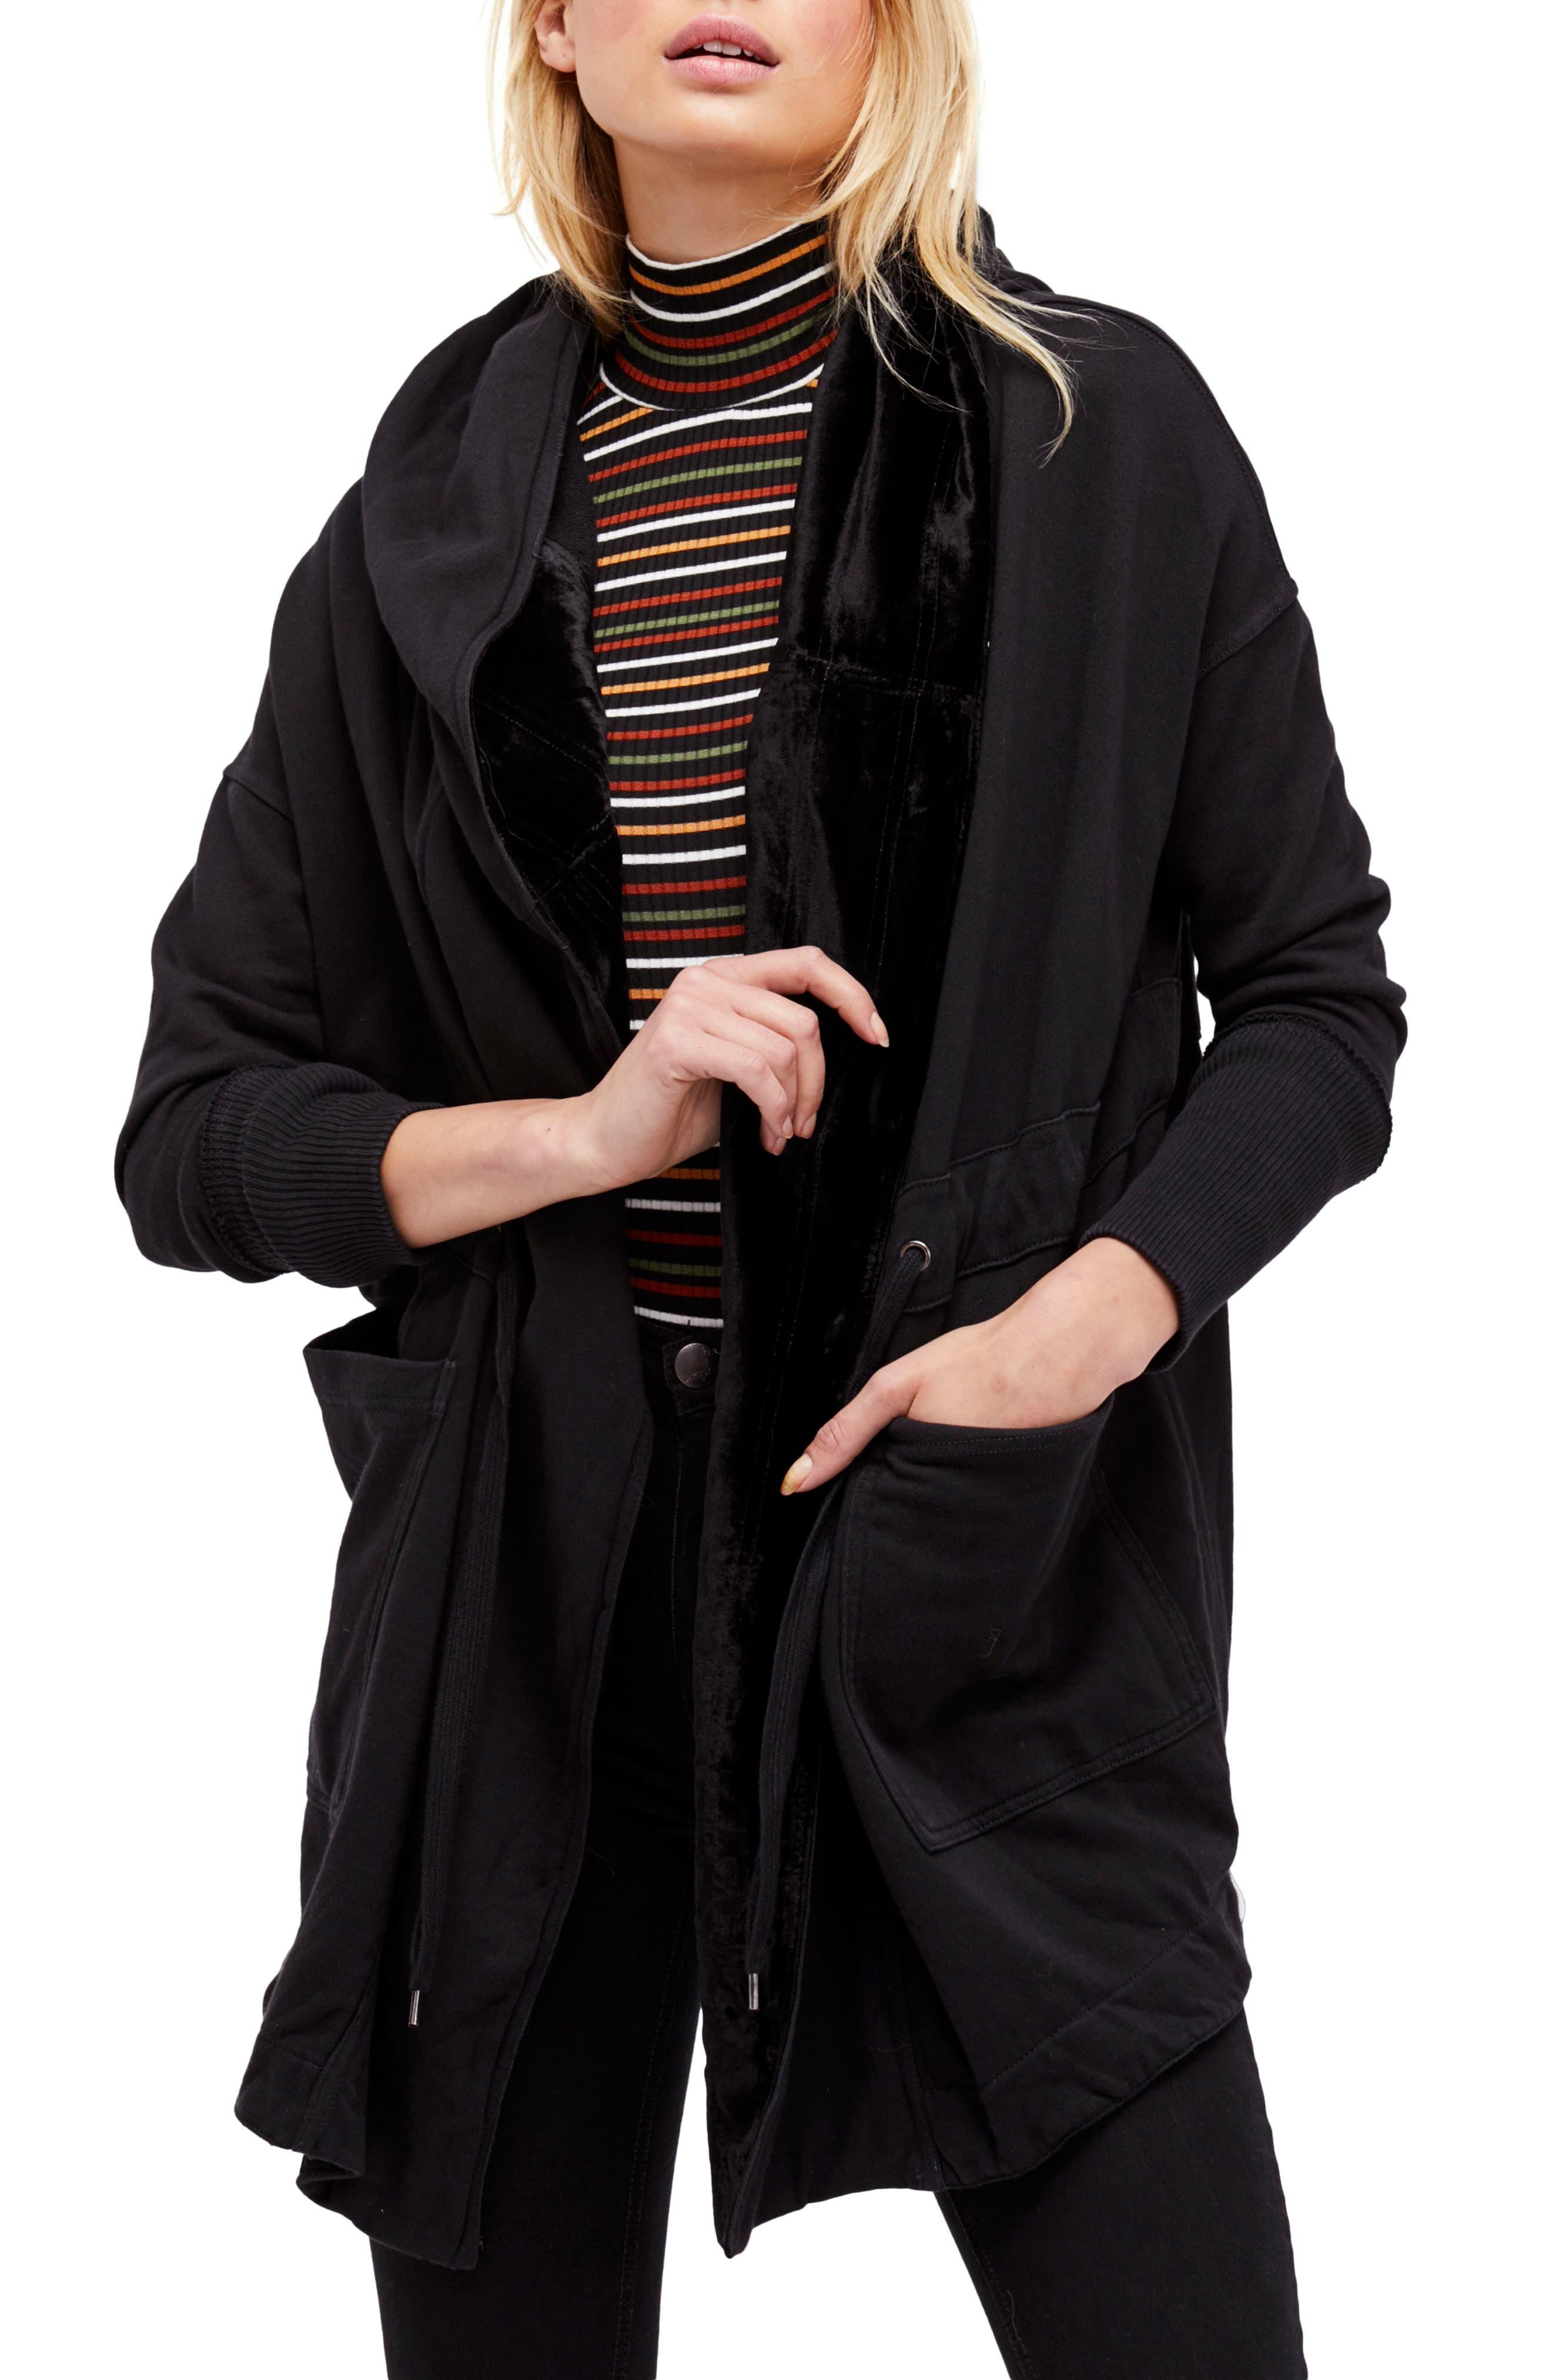 Westwood Cardigan,                             Main thumbnail 1, color,                             Black